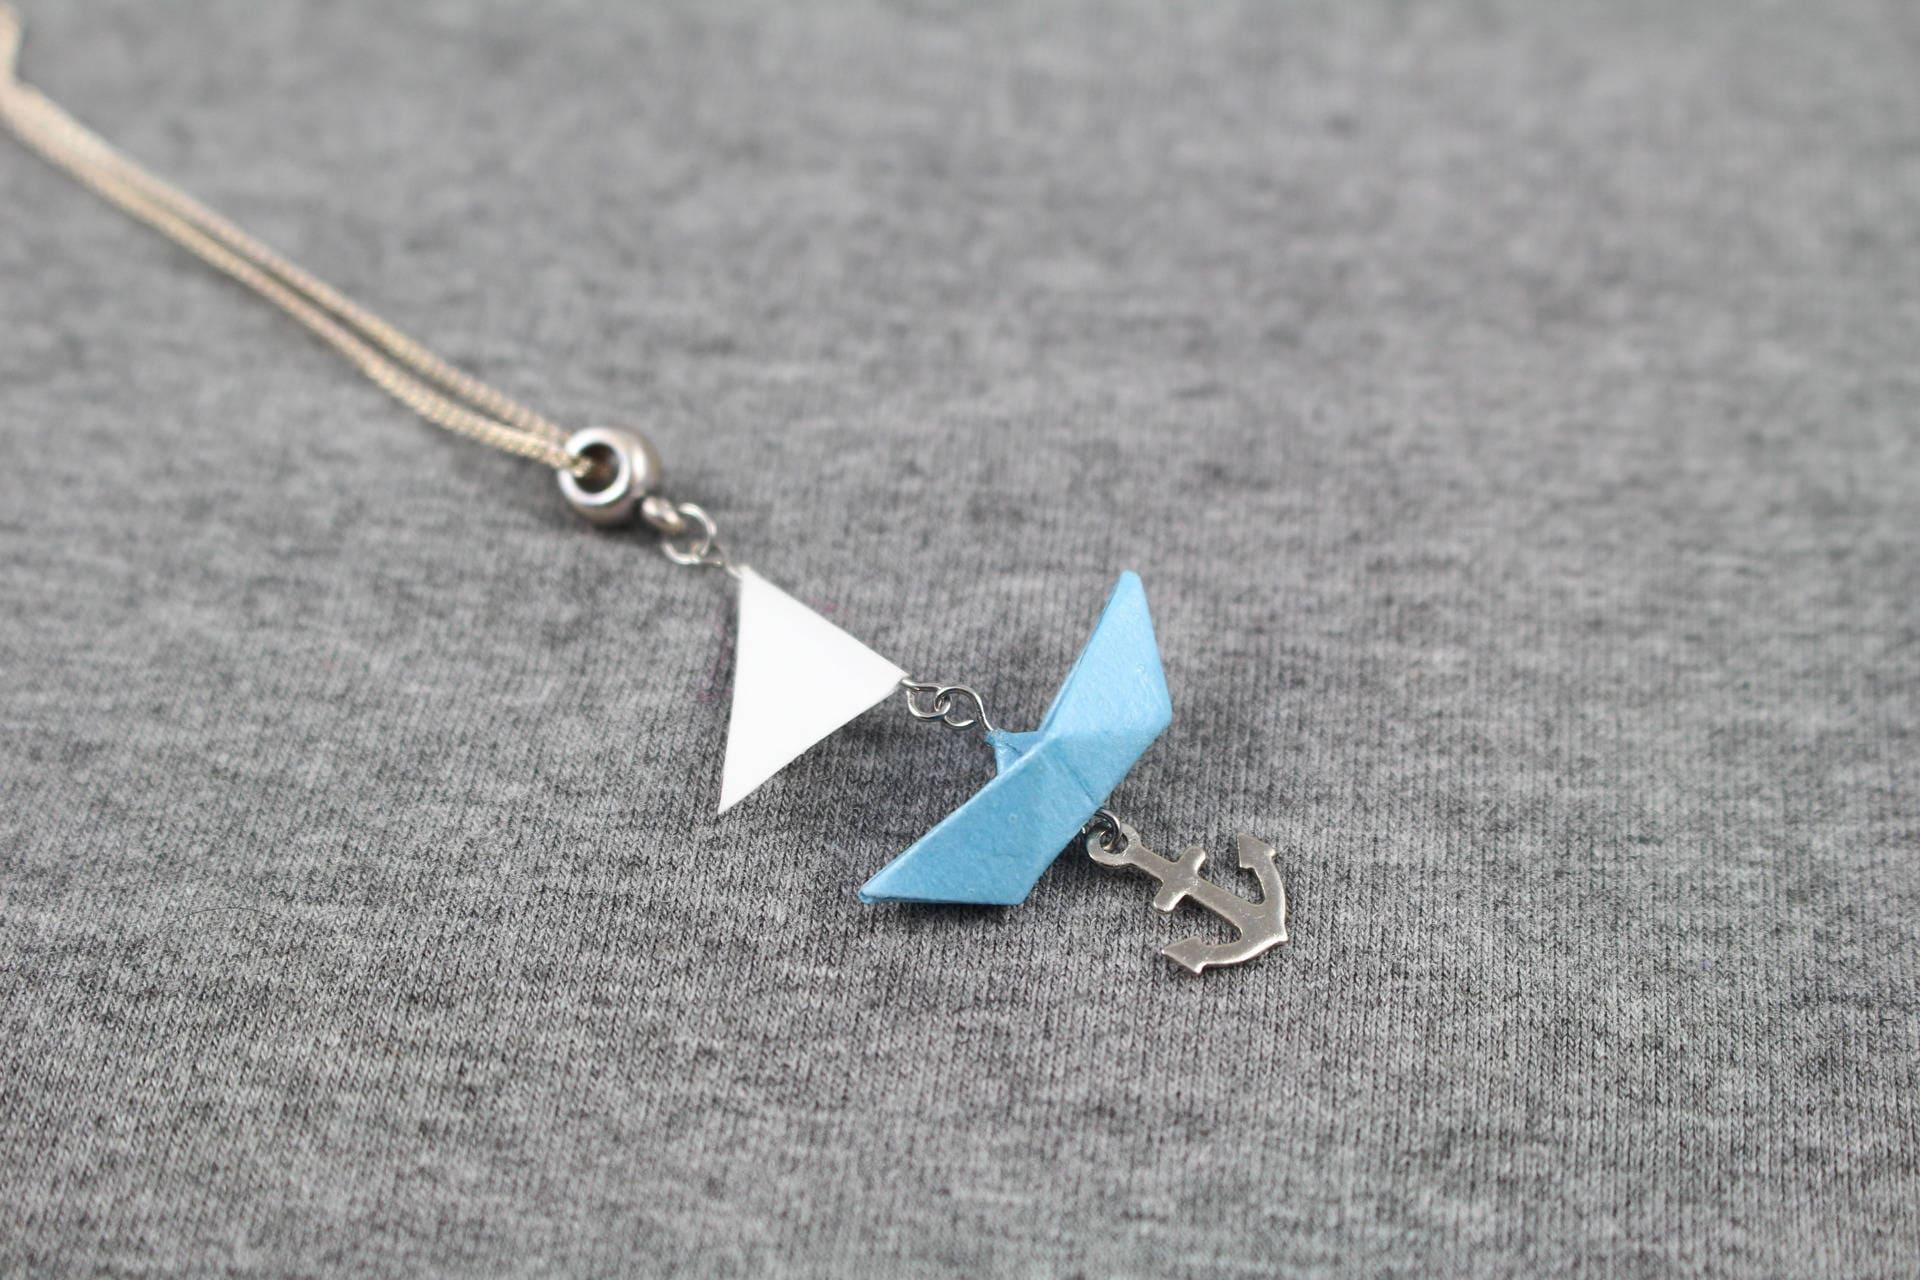 collier marin bateau voile bleu origami en papier. Black Bedroom Furniture Sets. Home Design Ideas